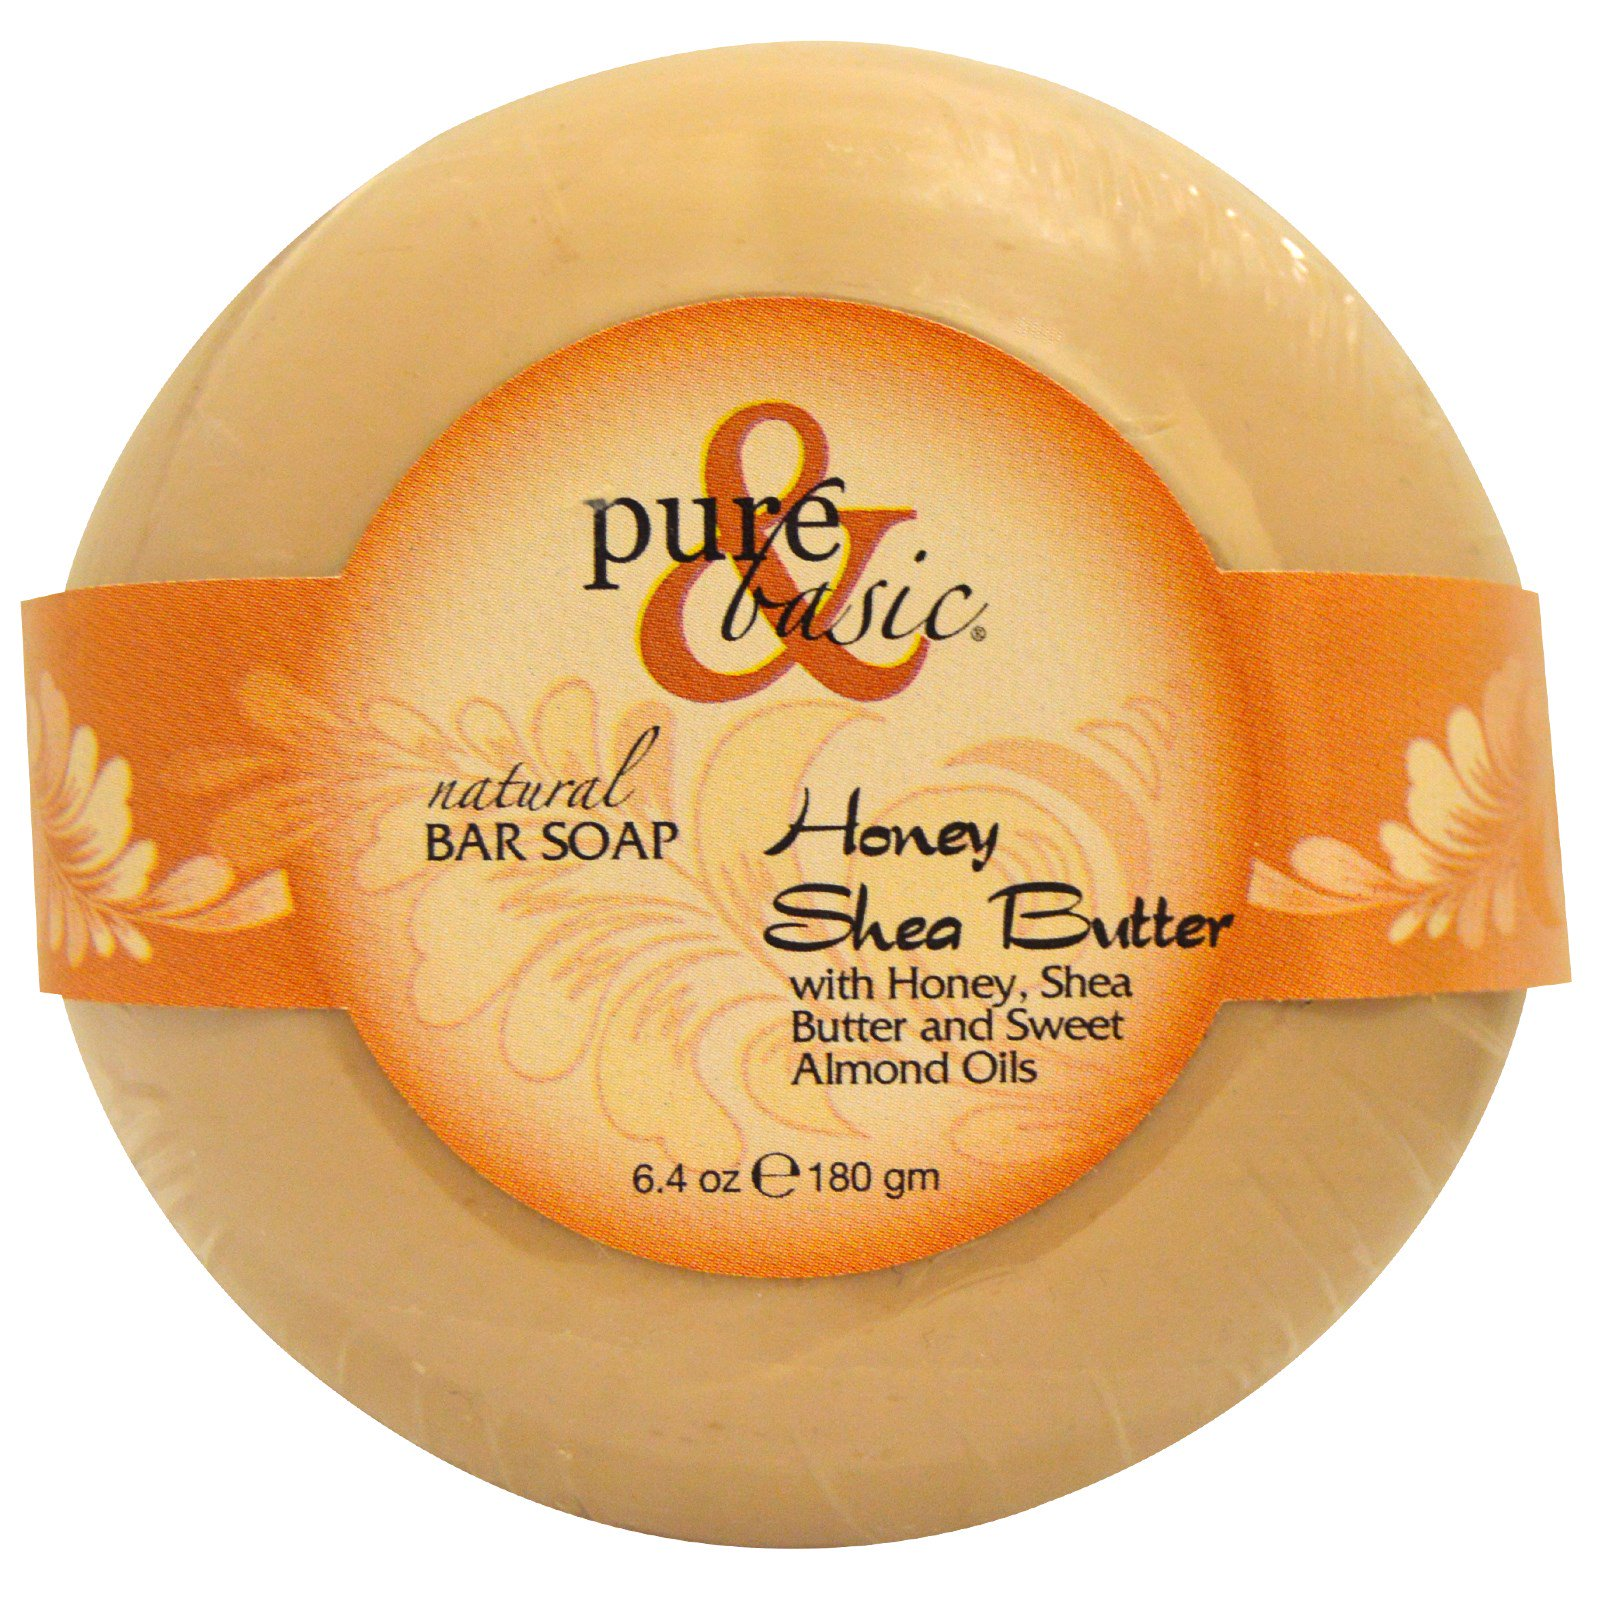 Pure & Basic, Natural Bar Soap, Honey Shea Butter, 6.4 oz (180 g) Bar